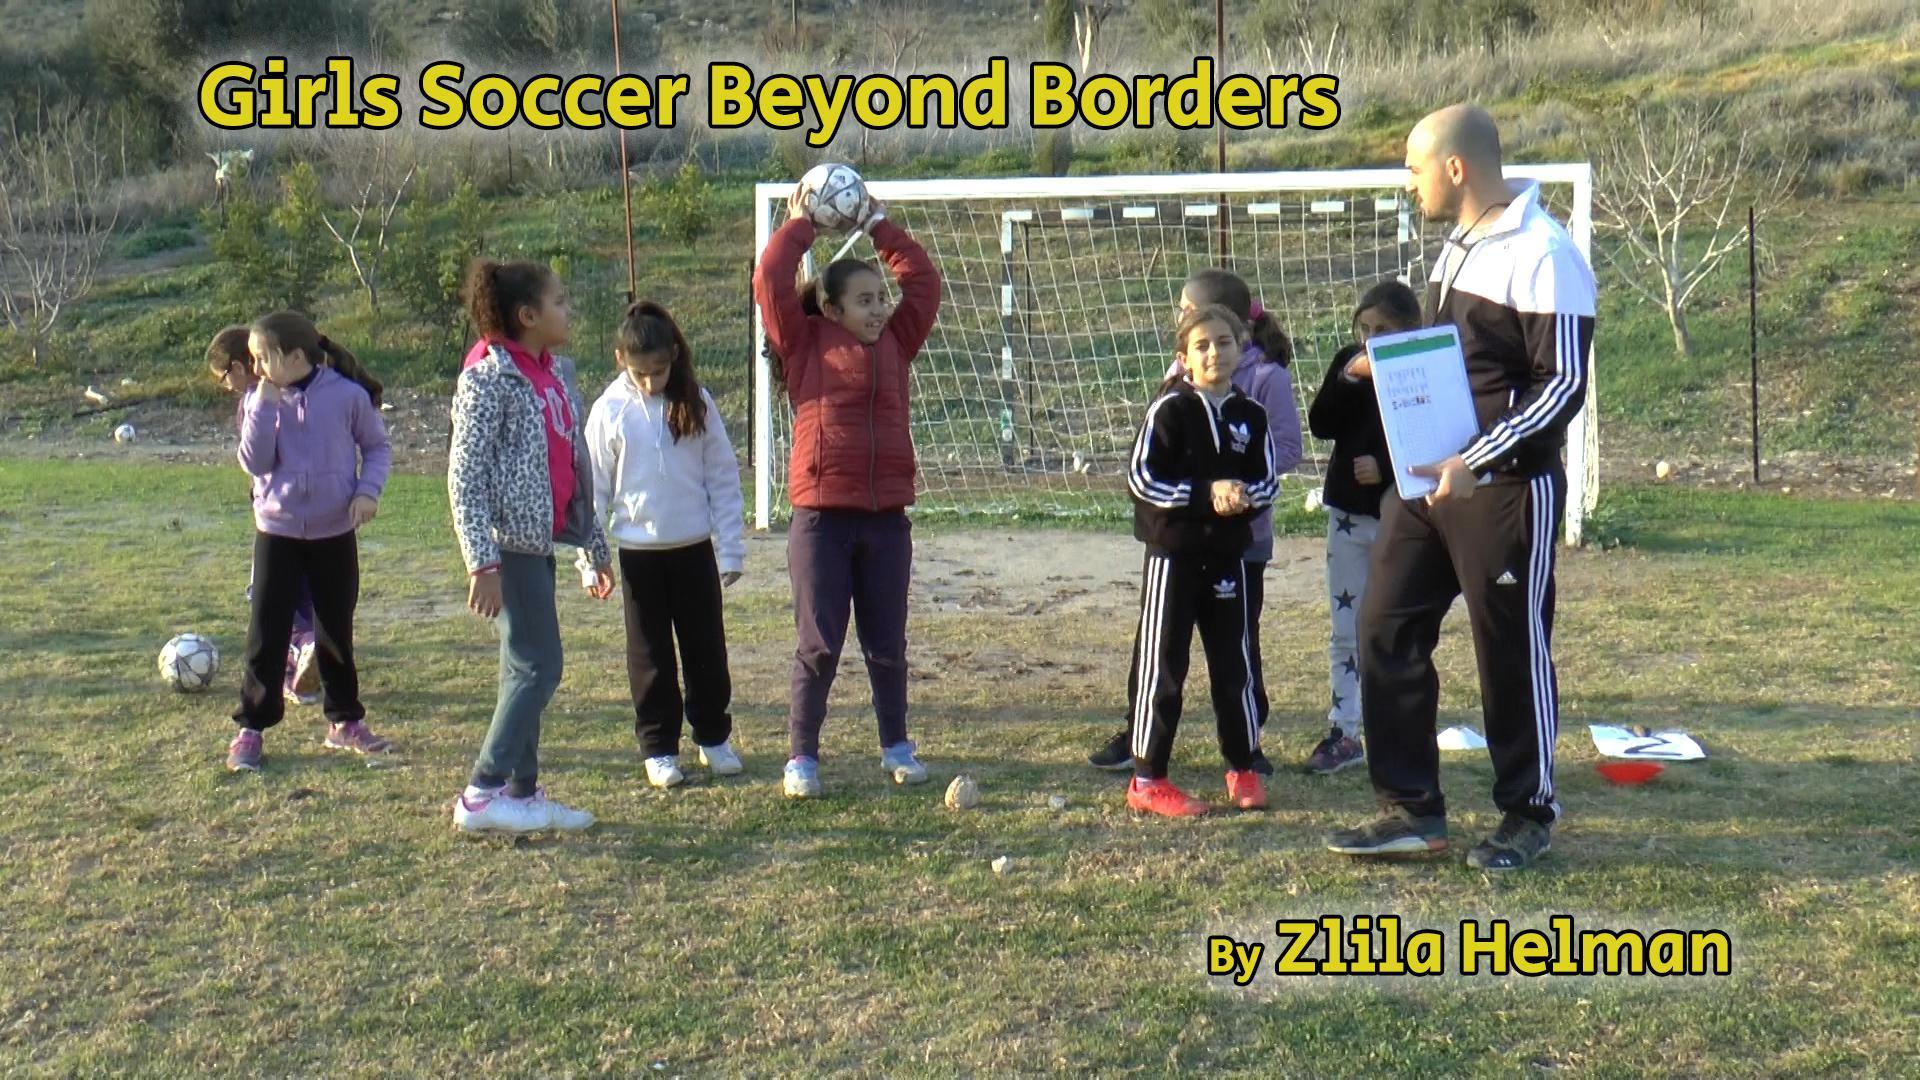 Girls Soccer Beyond Borders